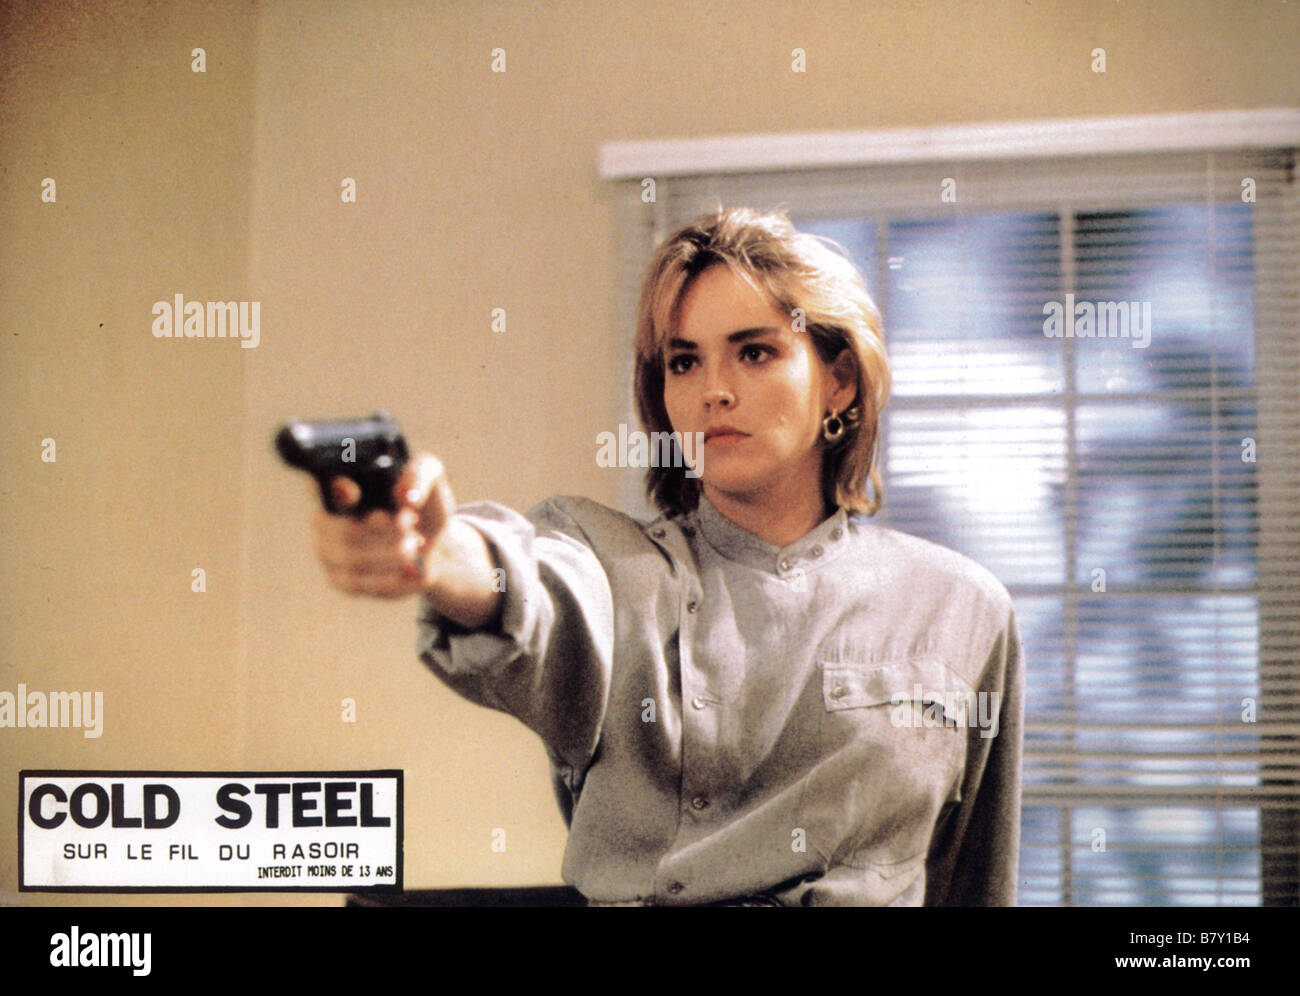 Sharon Stone Cold Steel - US